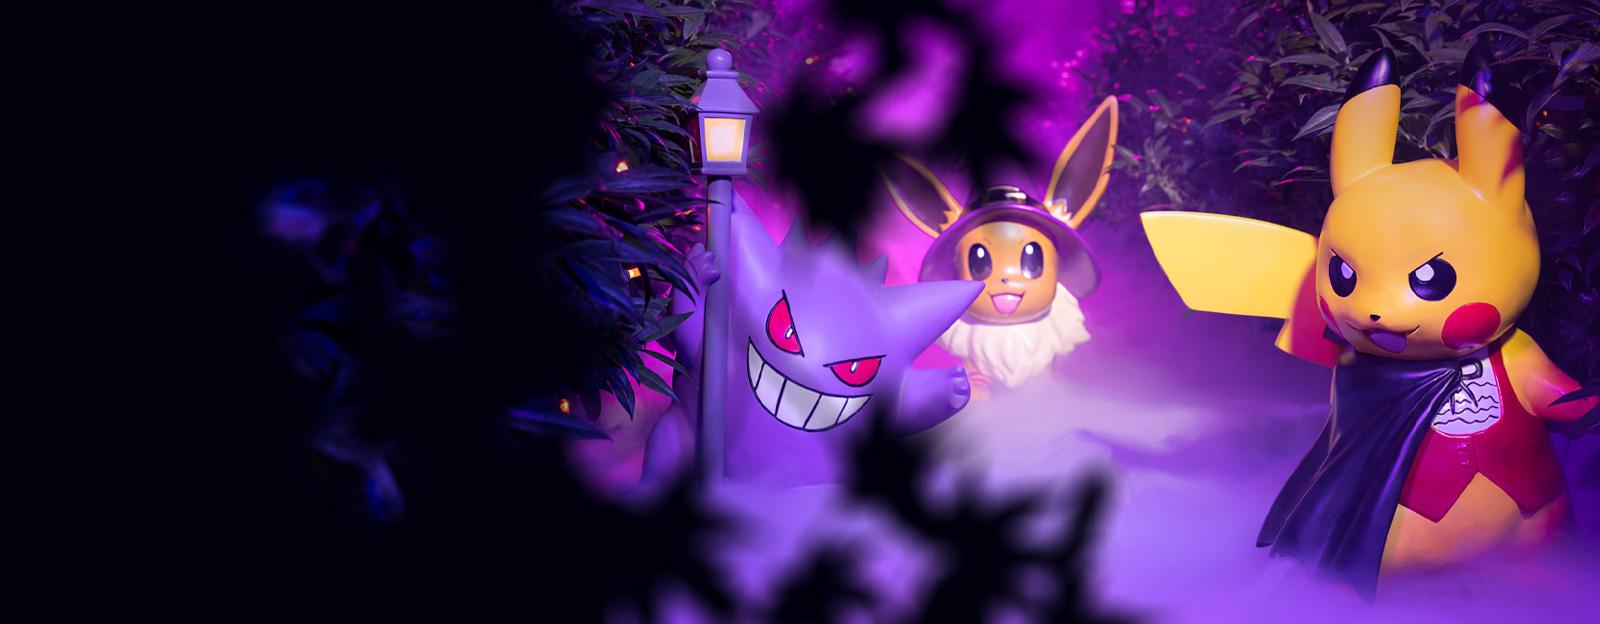 Pokemon_Spooky_Celebration_Yard_Statue_Group_Lifestyle_Image.jpg